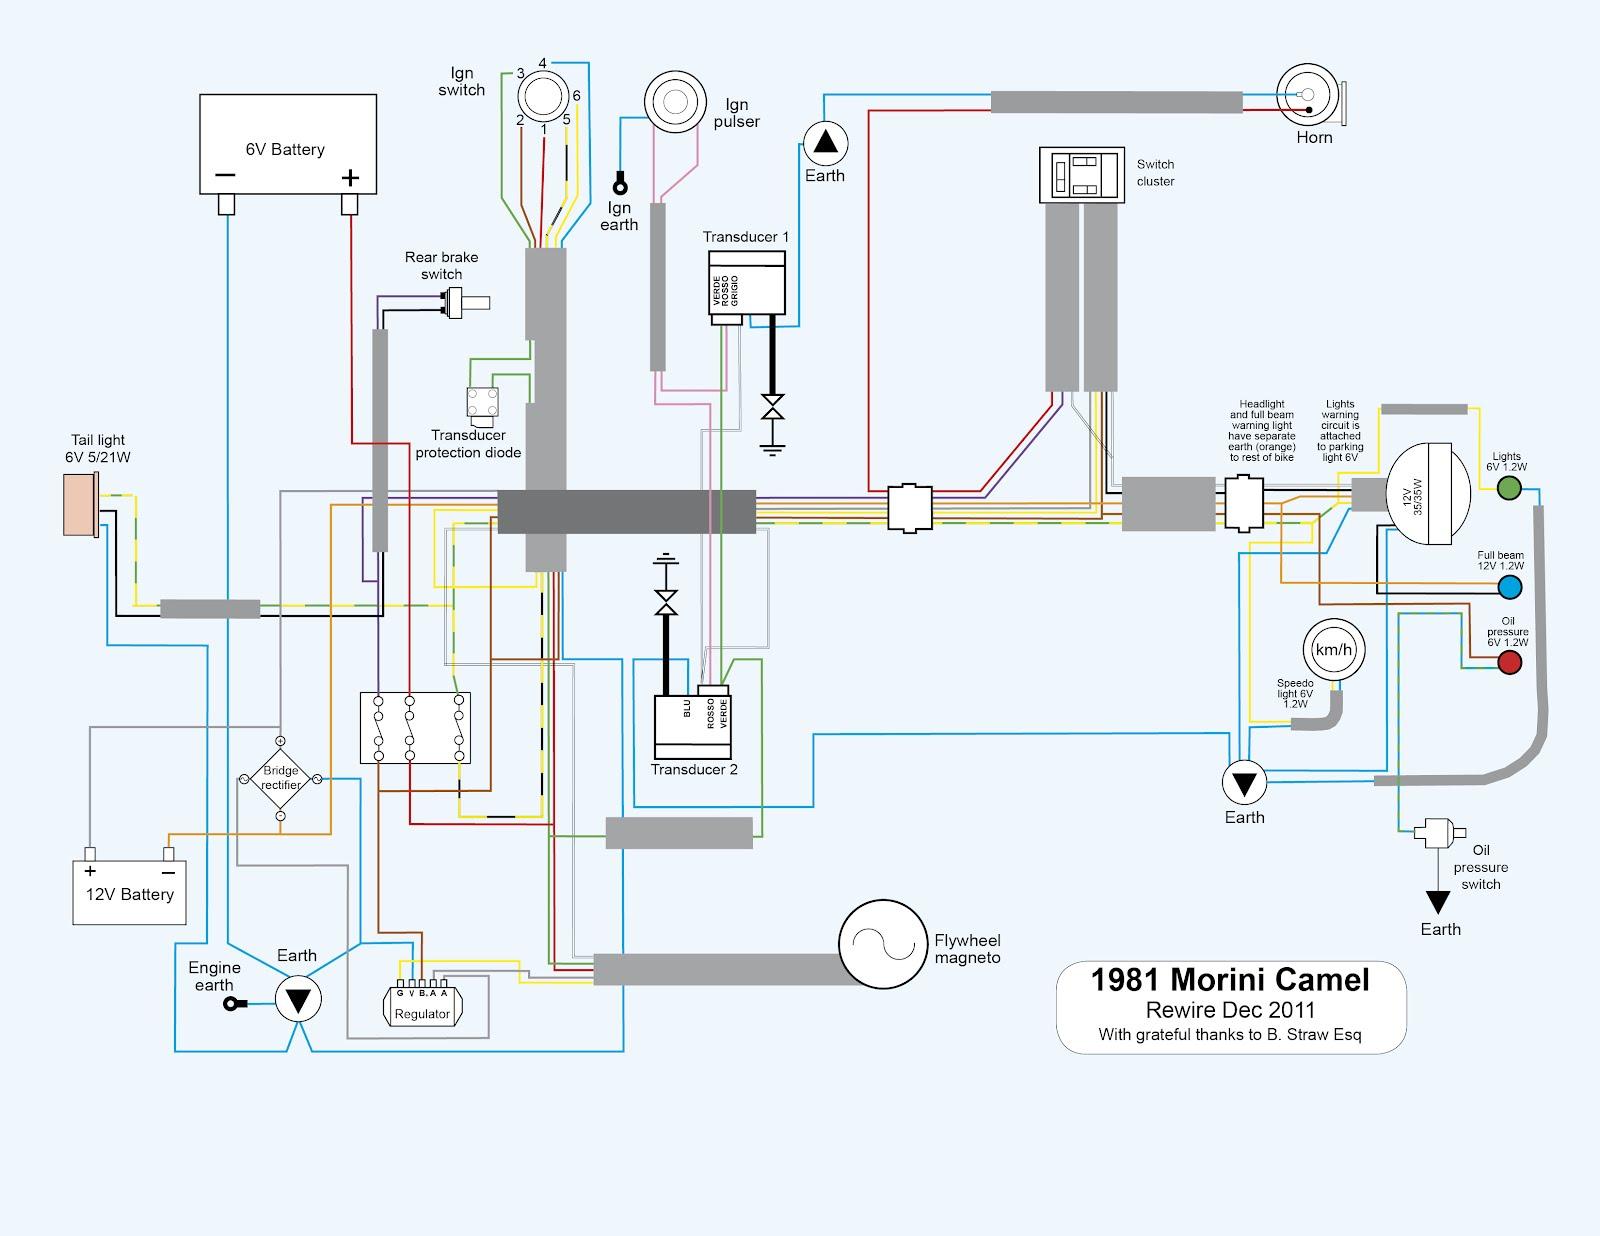 medium resolution of old bike hack 2012 camel 2bloom 2bno 2bindics 2b12v 2bconversion old bike hack 2012 bsa morini 500 camel wiring diagram